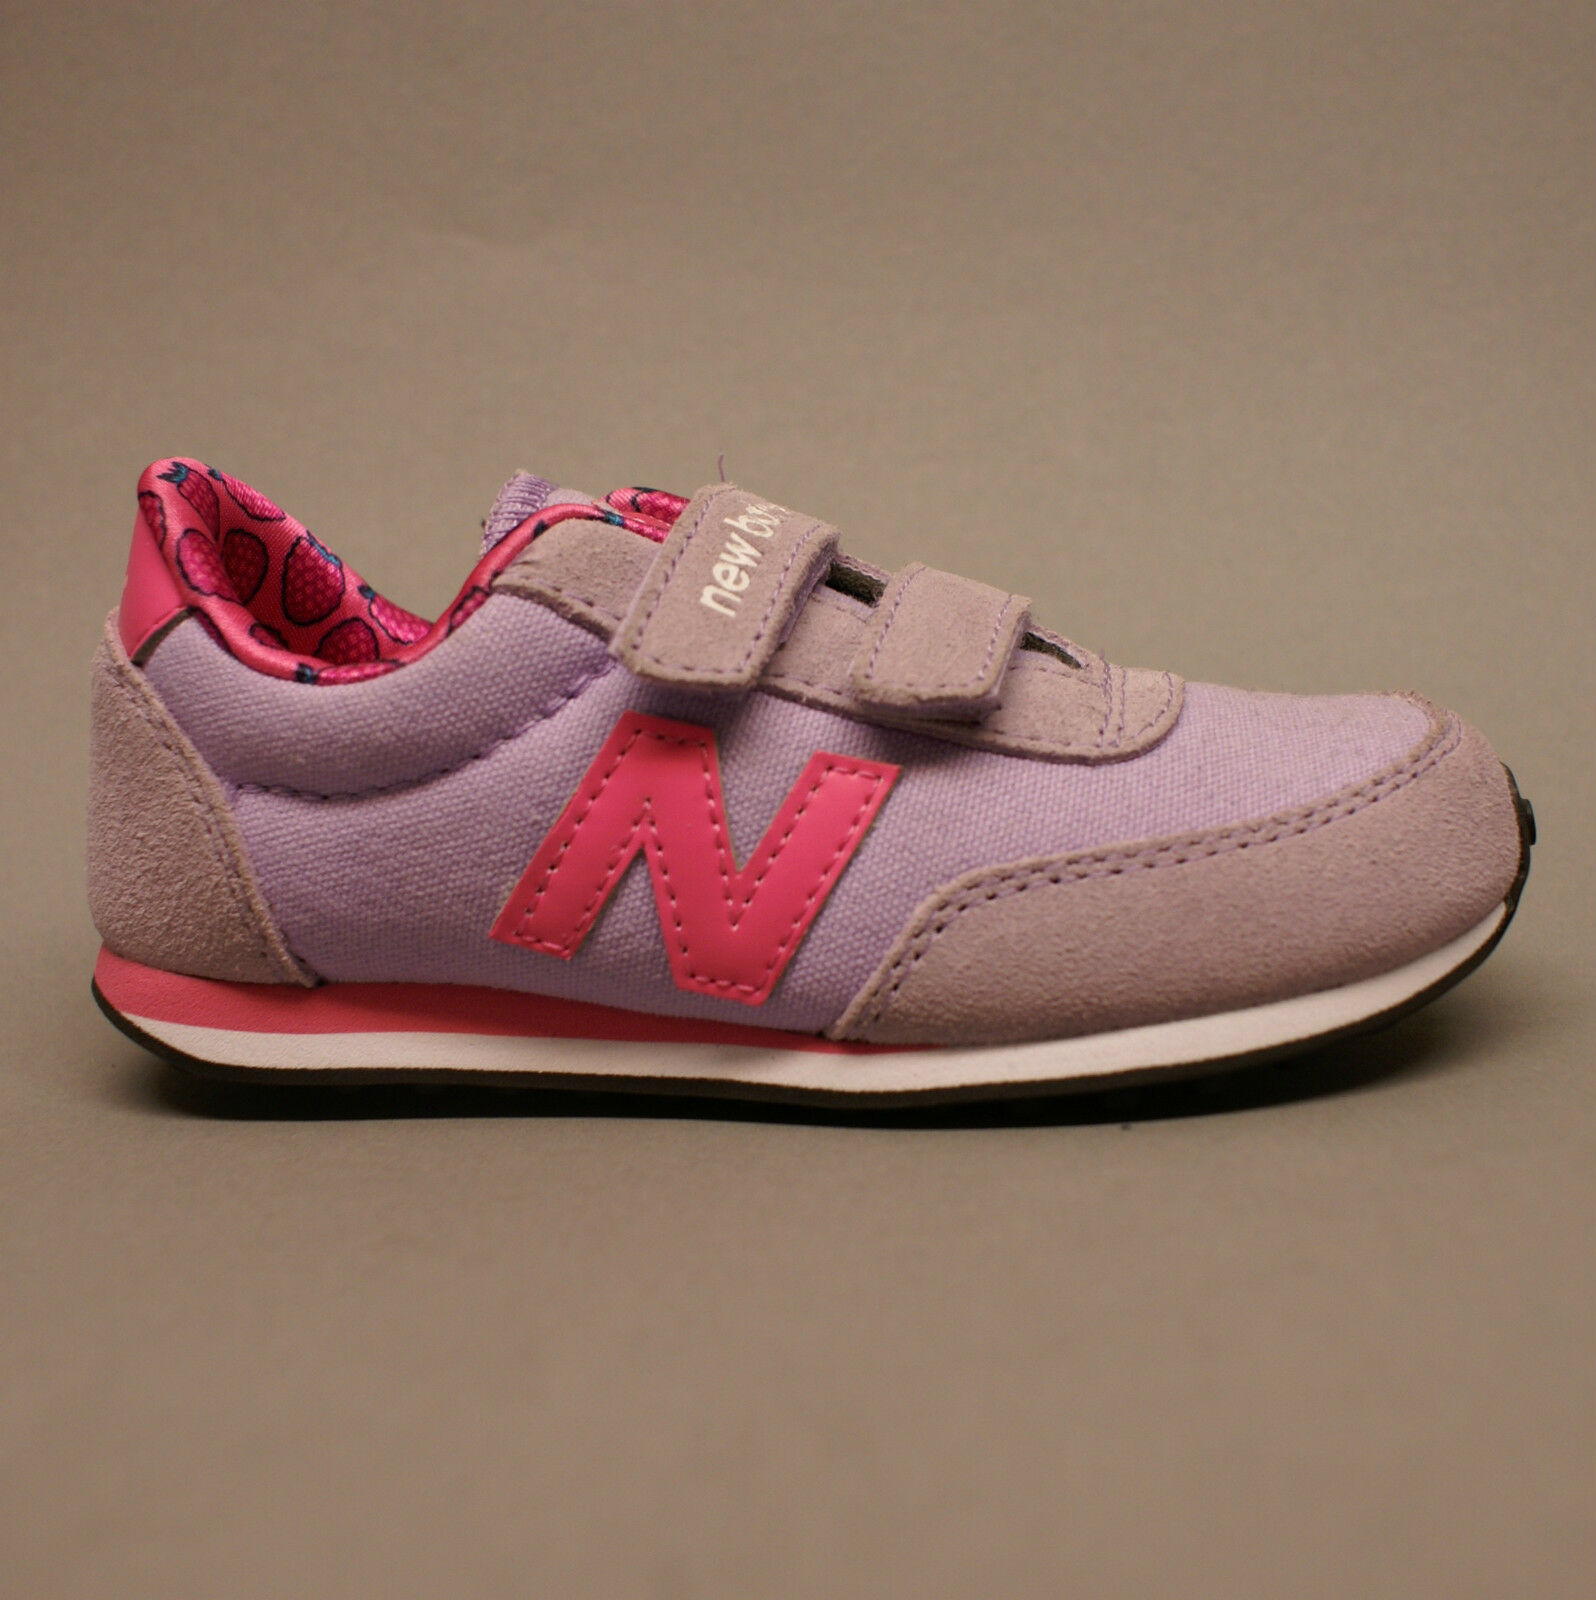 New Balance Girls KE410FLY Pink Purple Turnschuhe Sneakers für Mädchen rosa lila